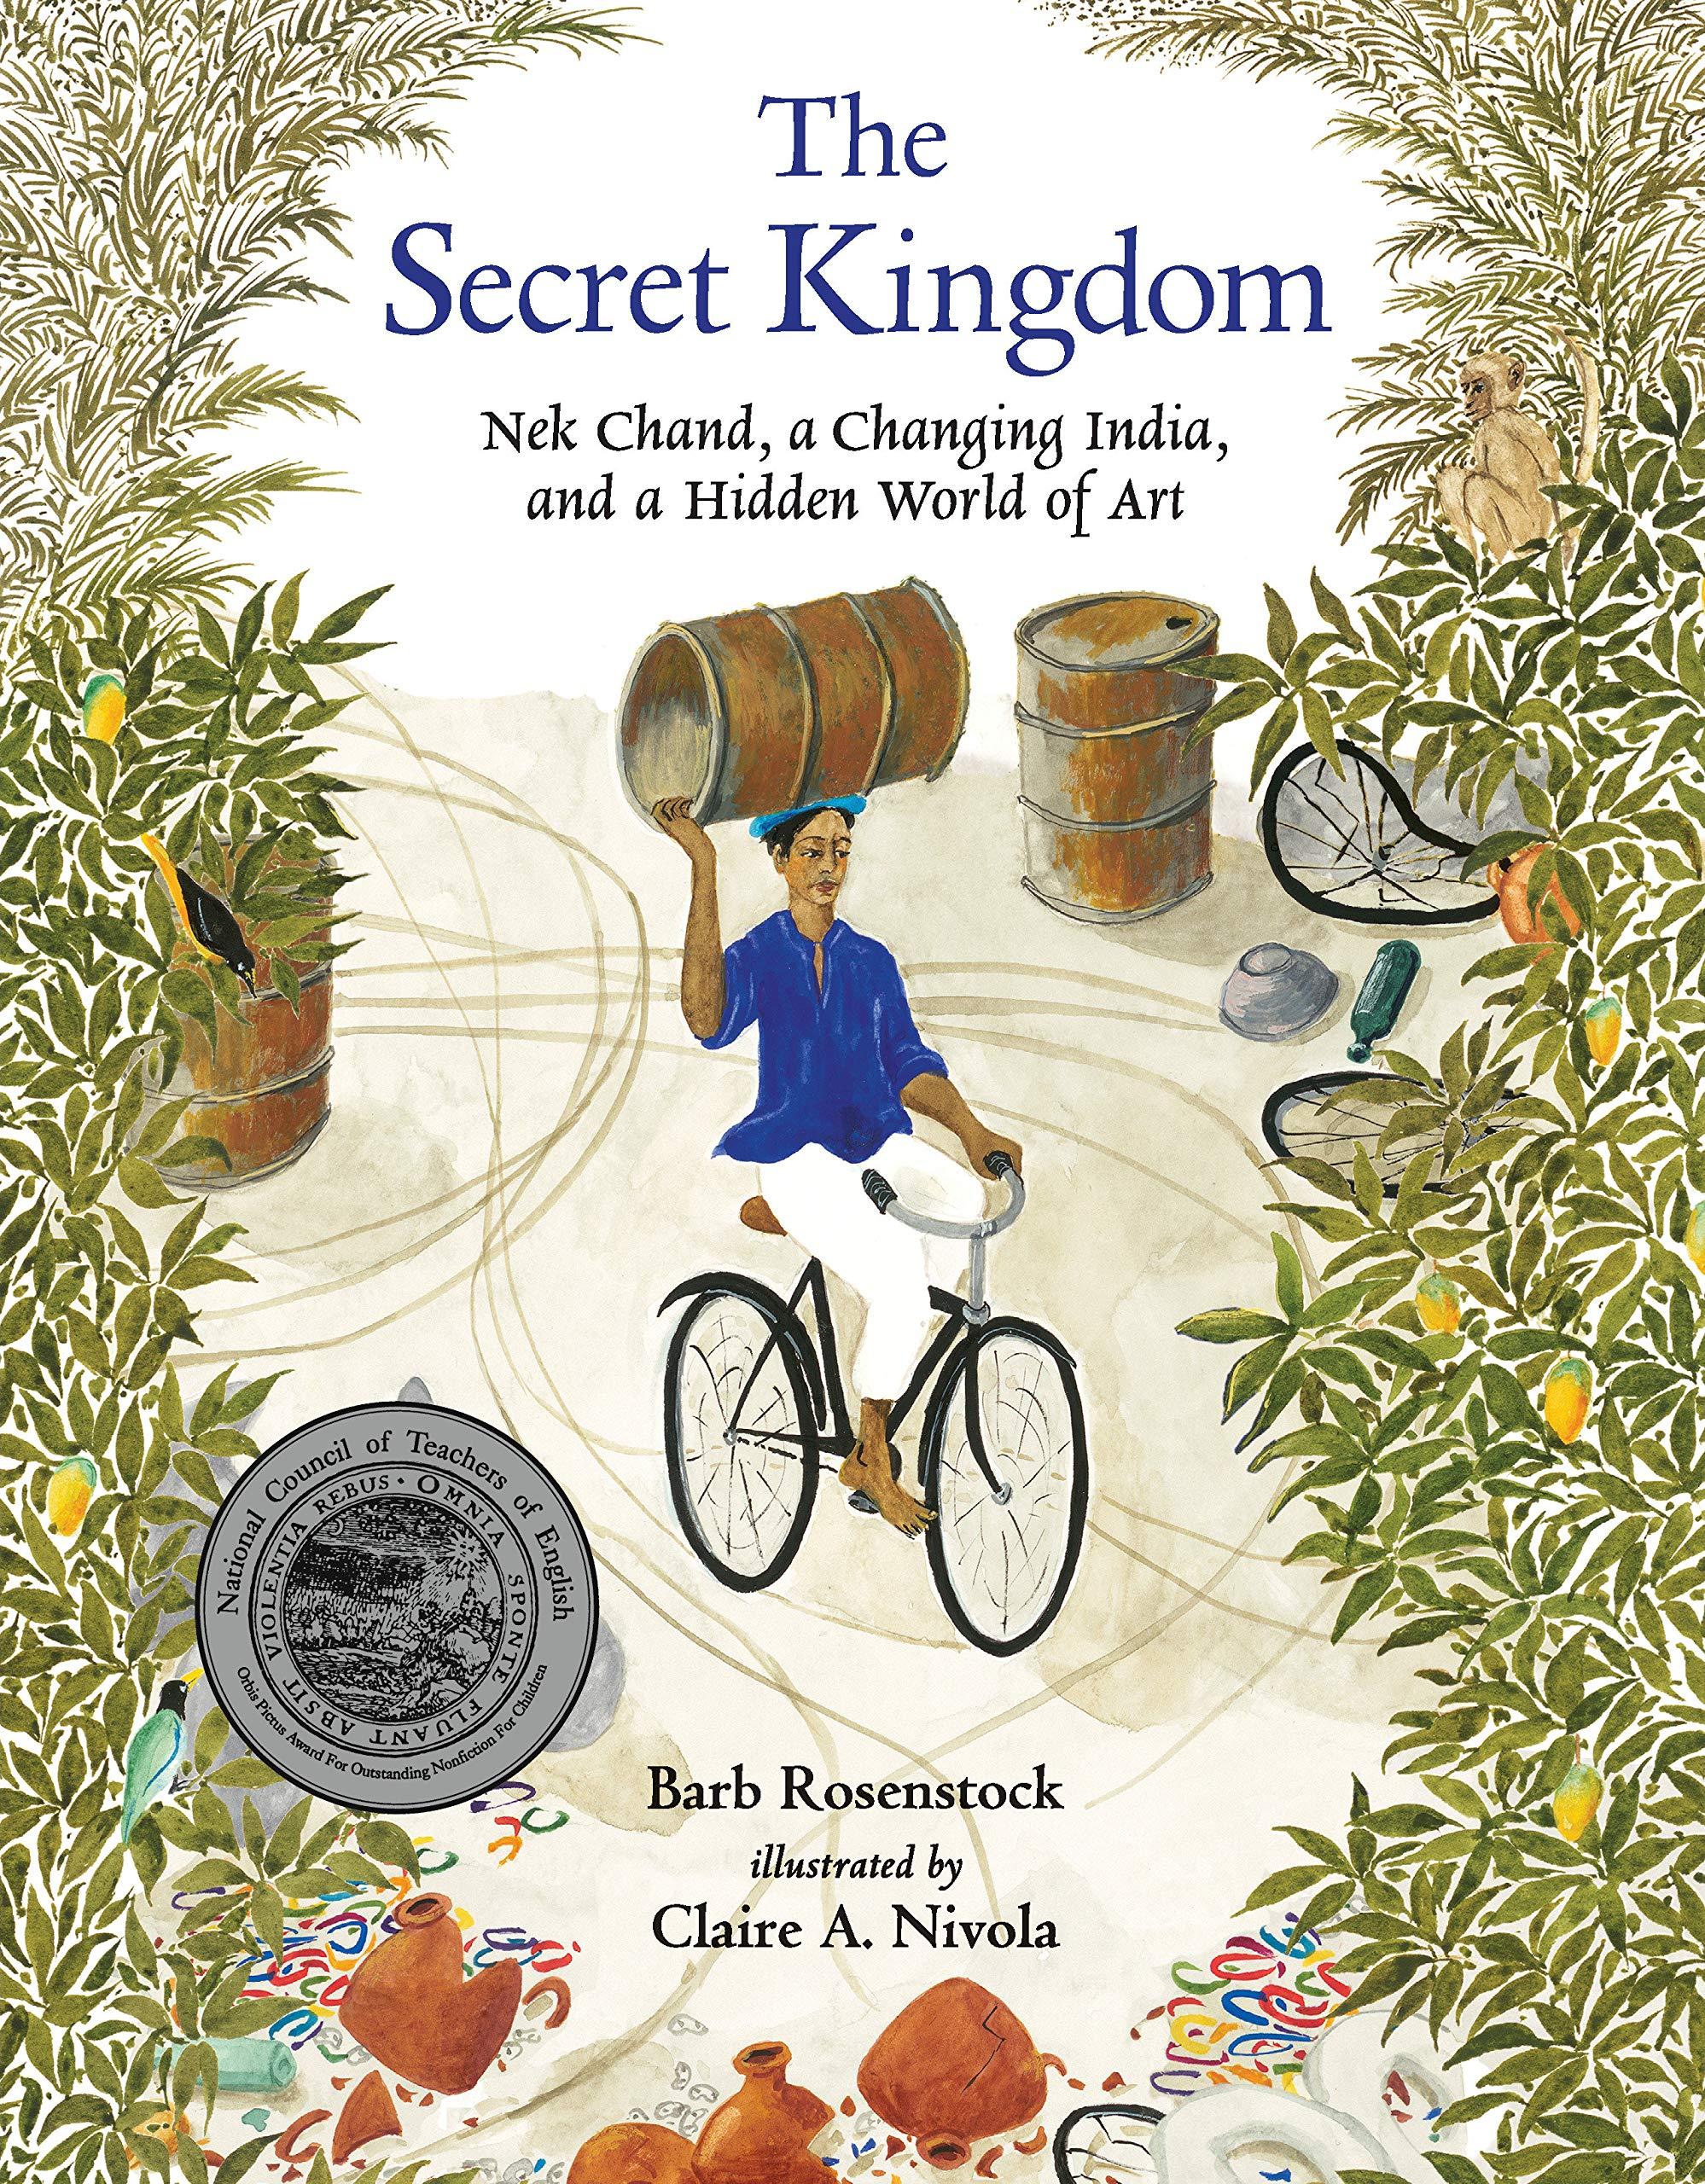 The Secret Kingdom: Nek Chand, a Changing India, and a Hidden World of Art:  Rosenstock, Barb, Nivola, Claire A.: 9780763674755: Amazon.com: Books